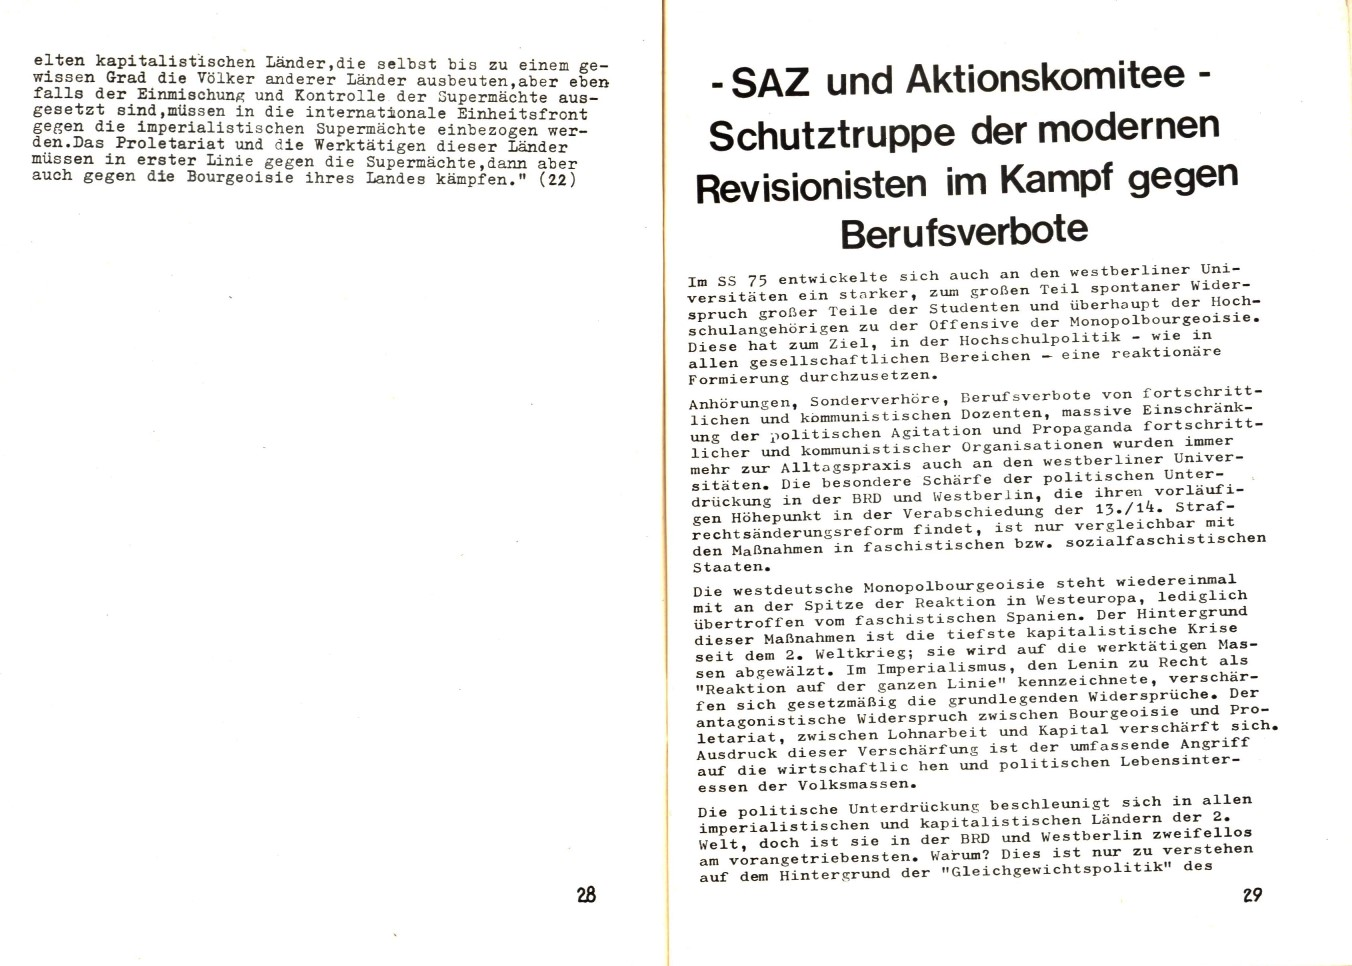 Berlin_KSV_1975_Dokumente_der_SAZ_16